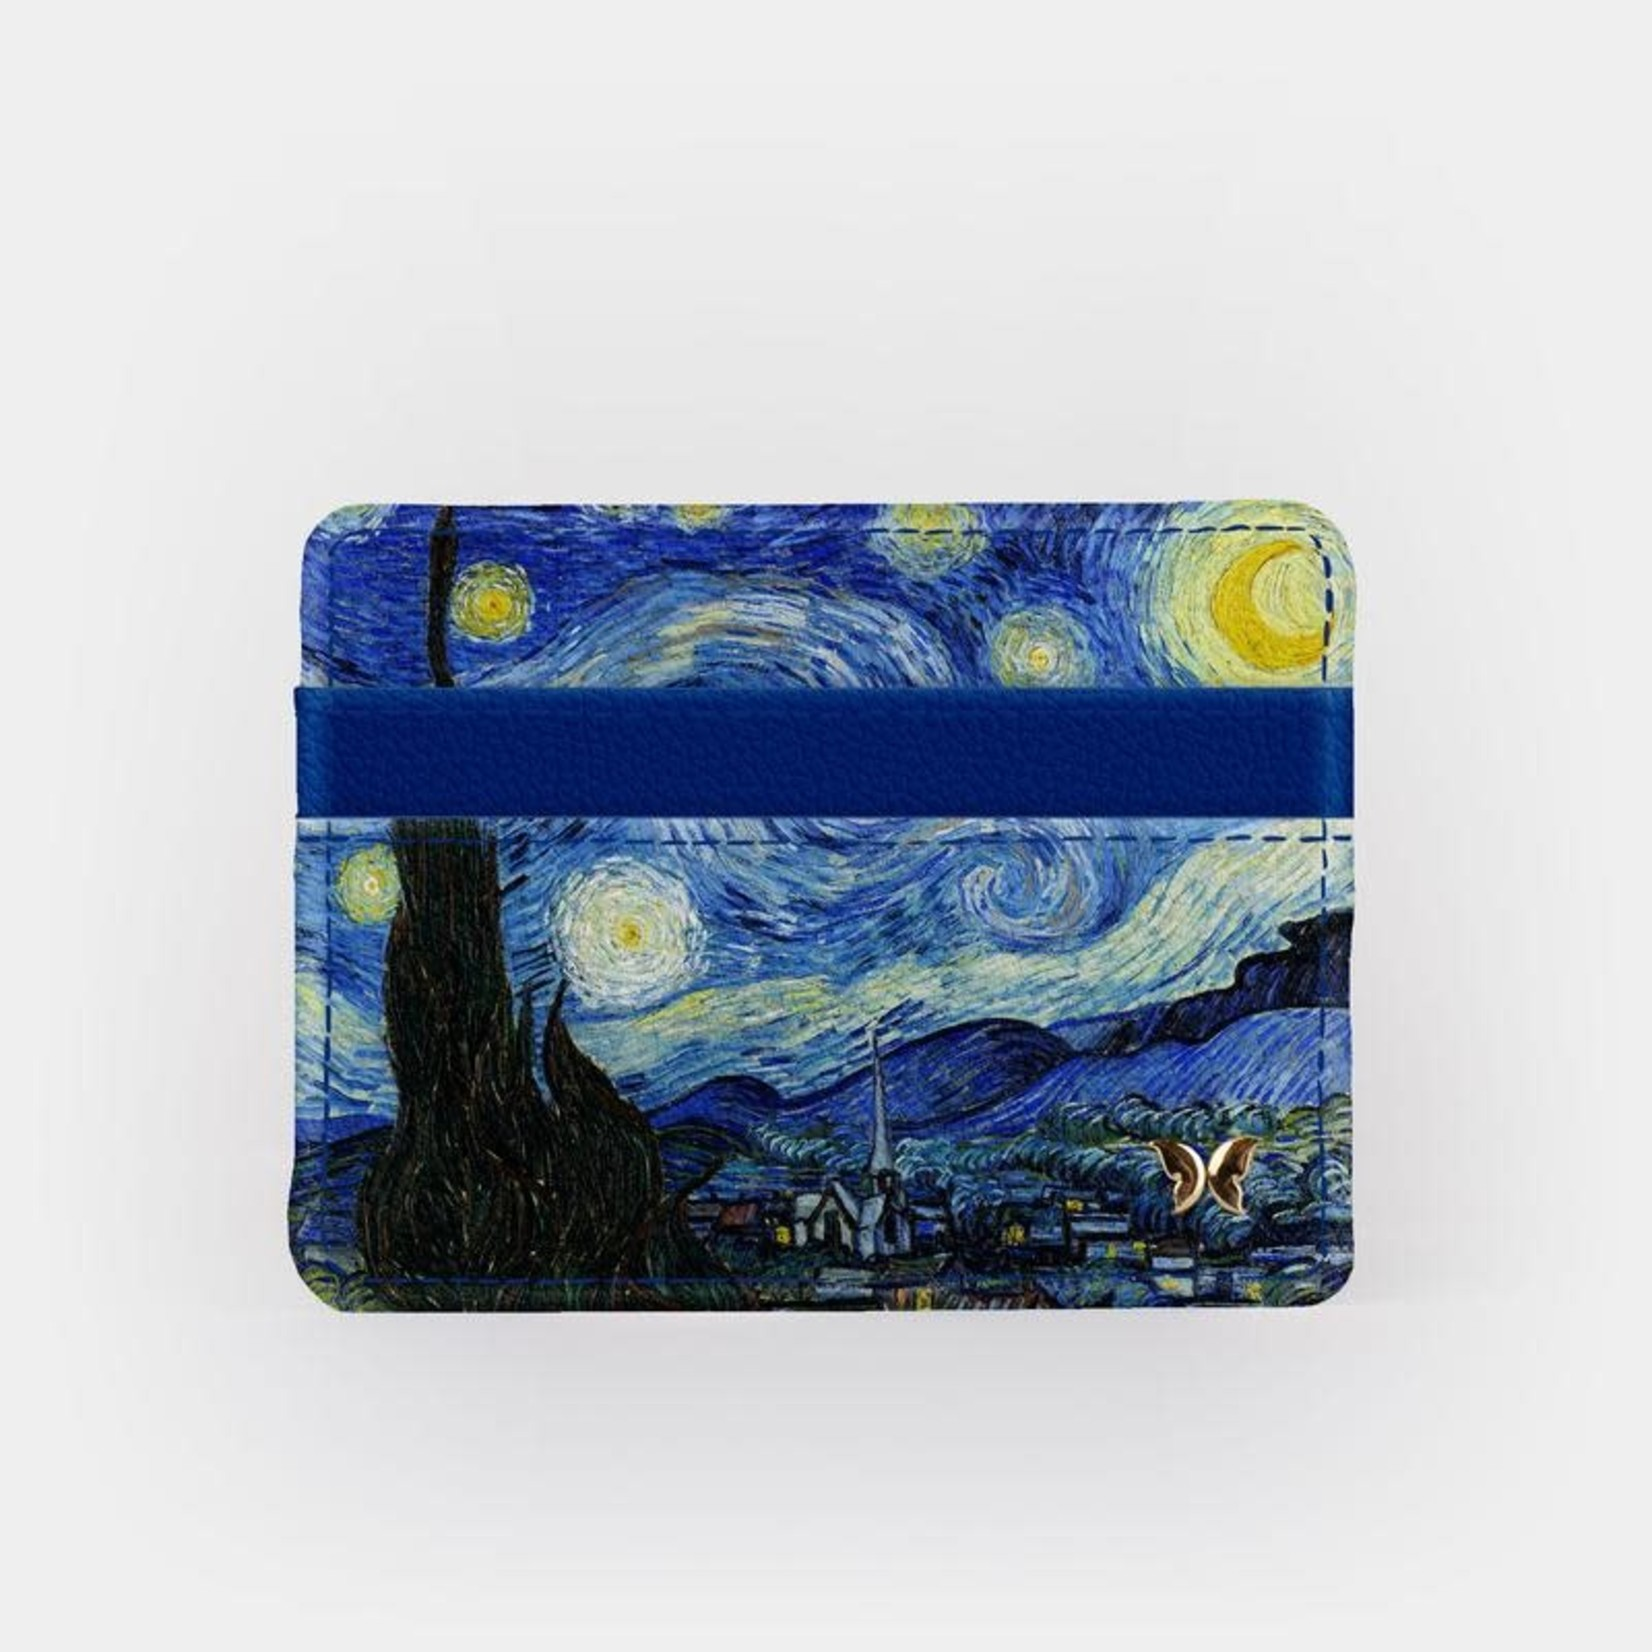 Monarque Slim Wallet - Van Gogh - The Starry Night